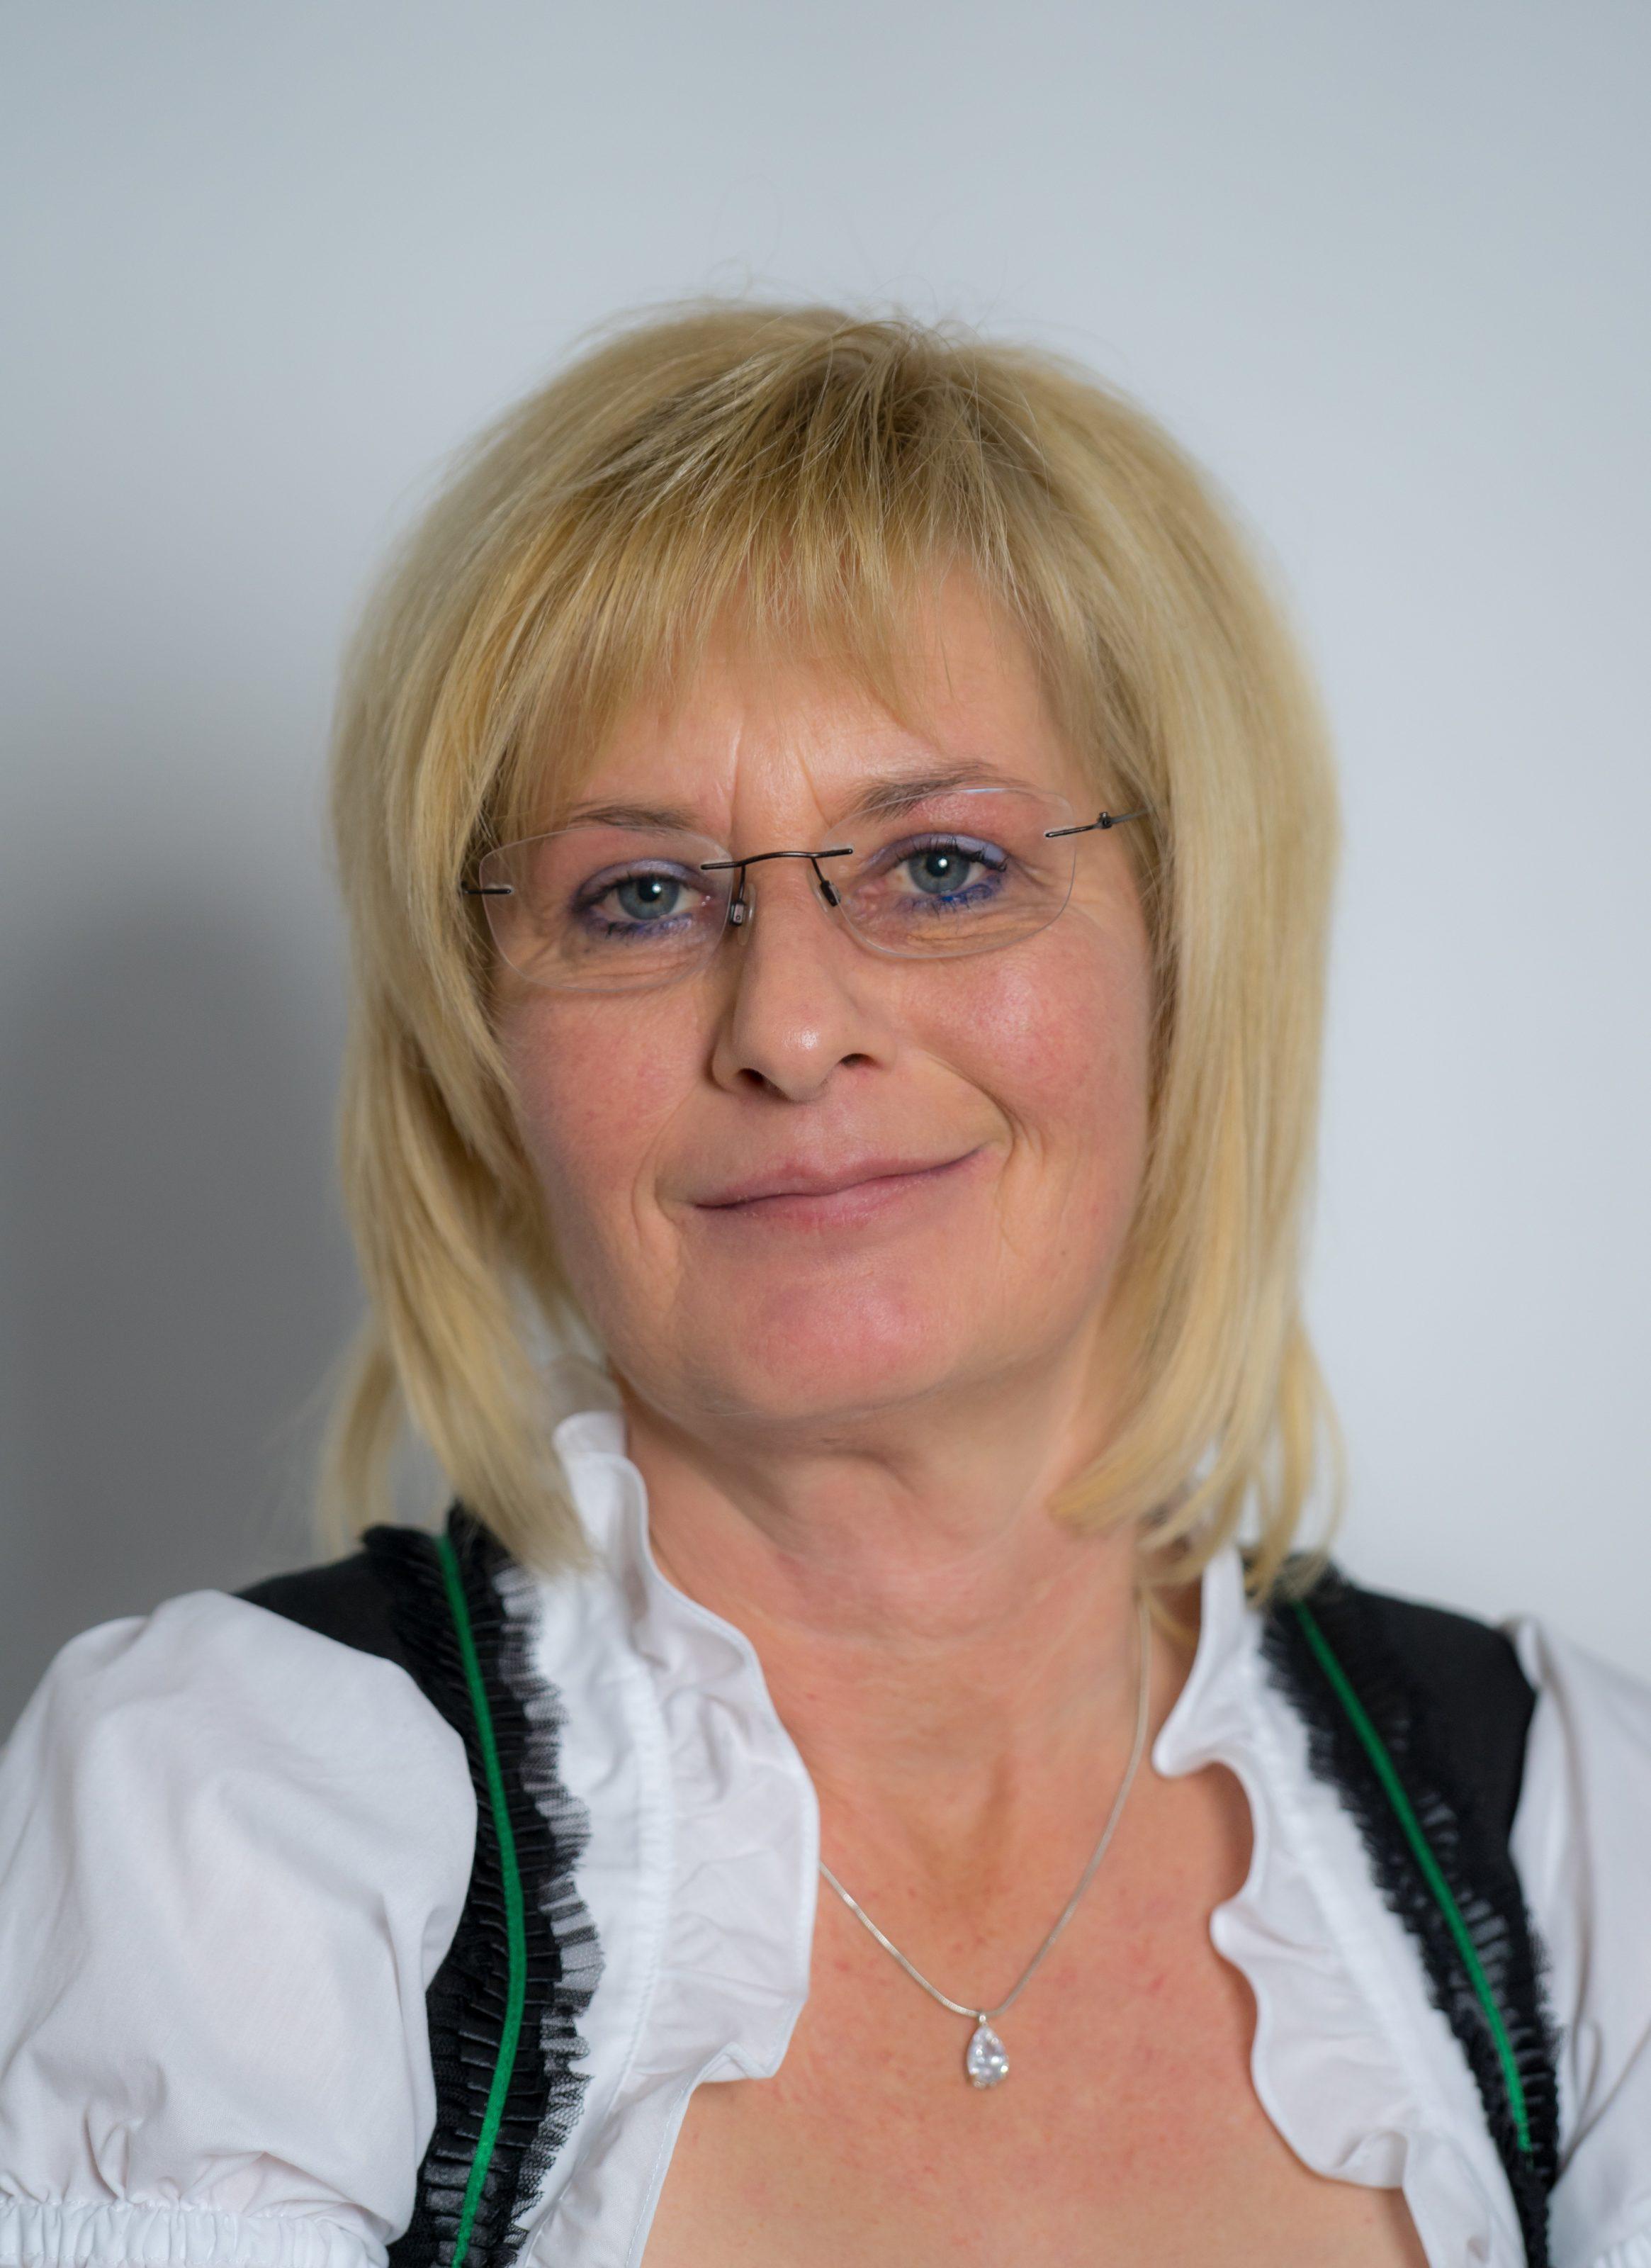 Evelyn Mühlböck